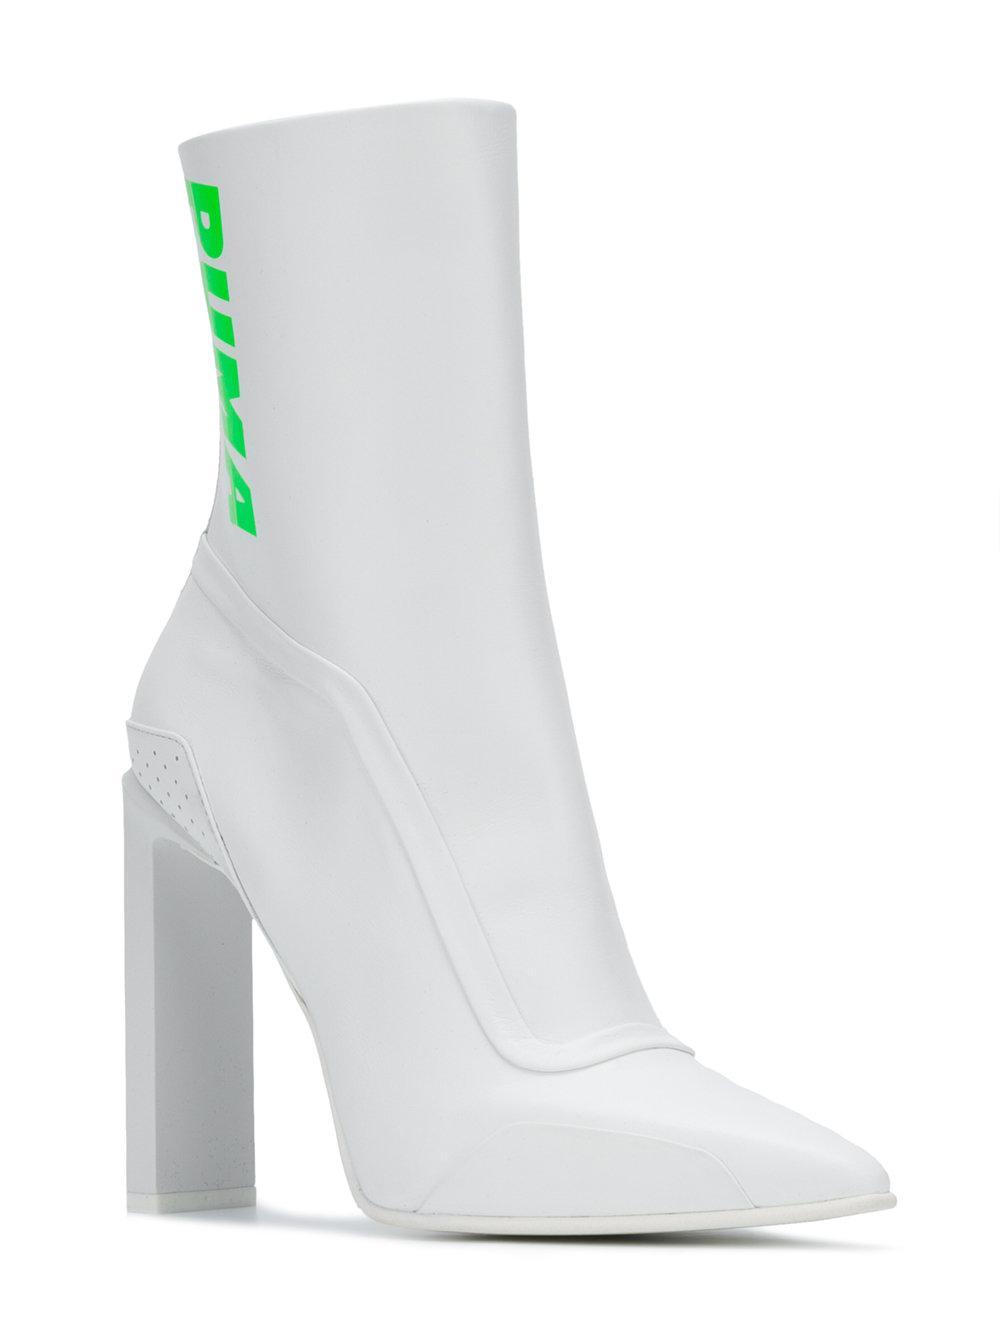 57829110fa3e Lyst - PUMA Logo Print Ankle Boots in White